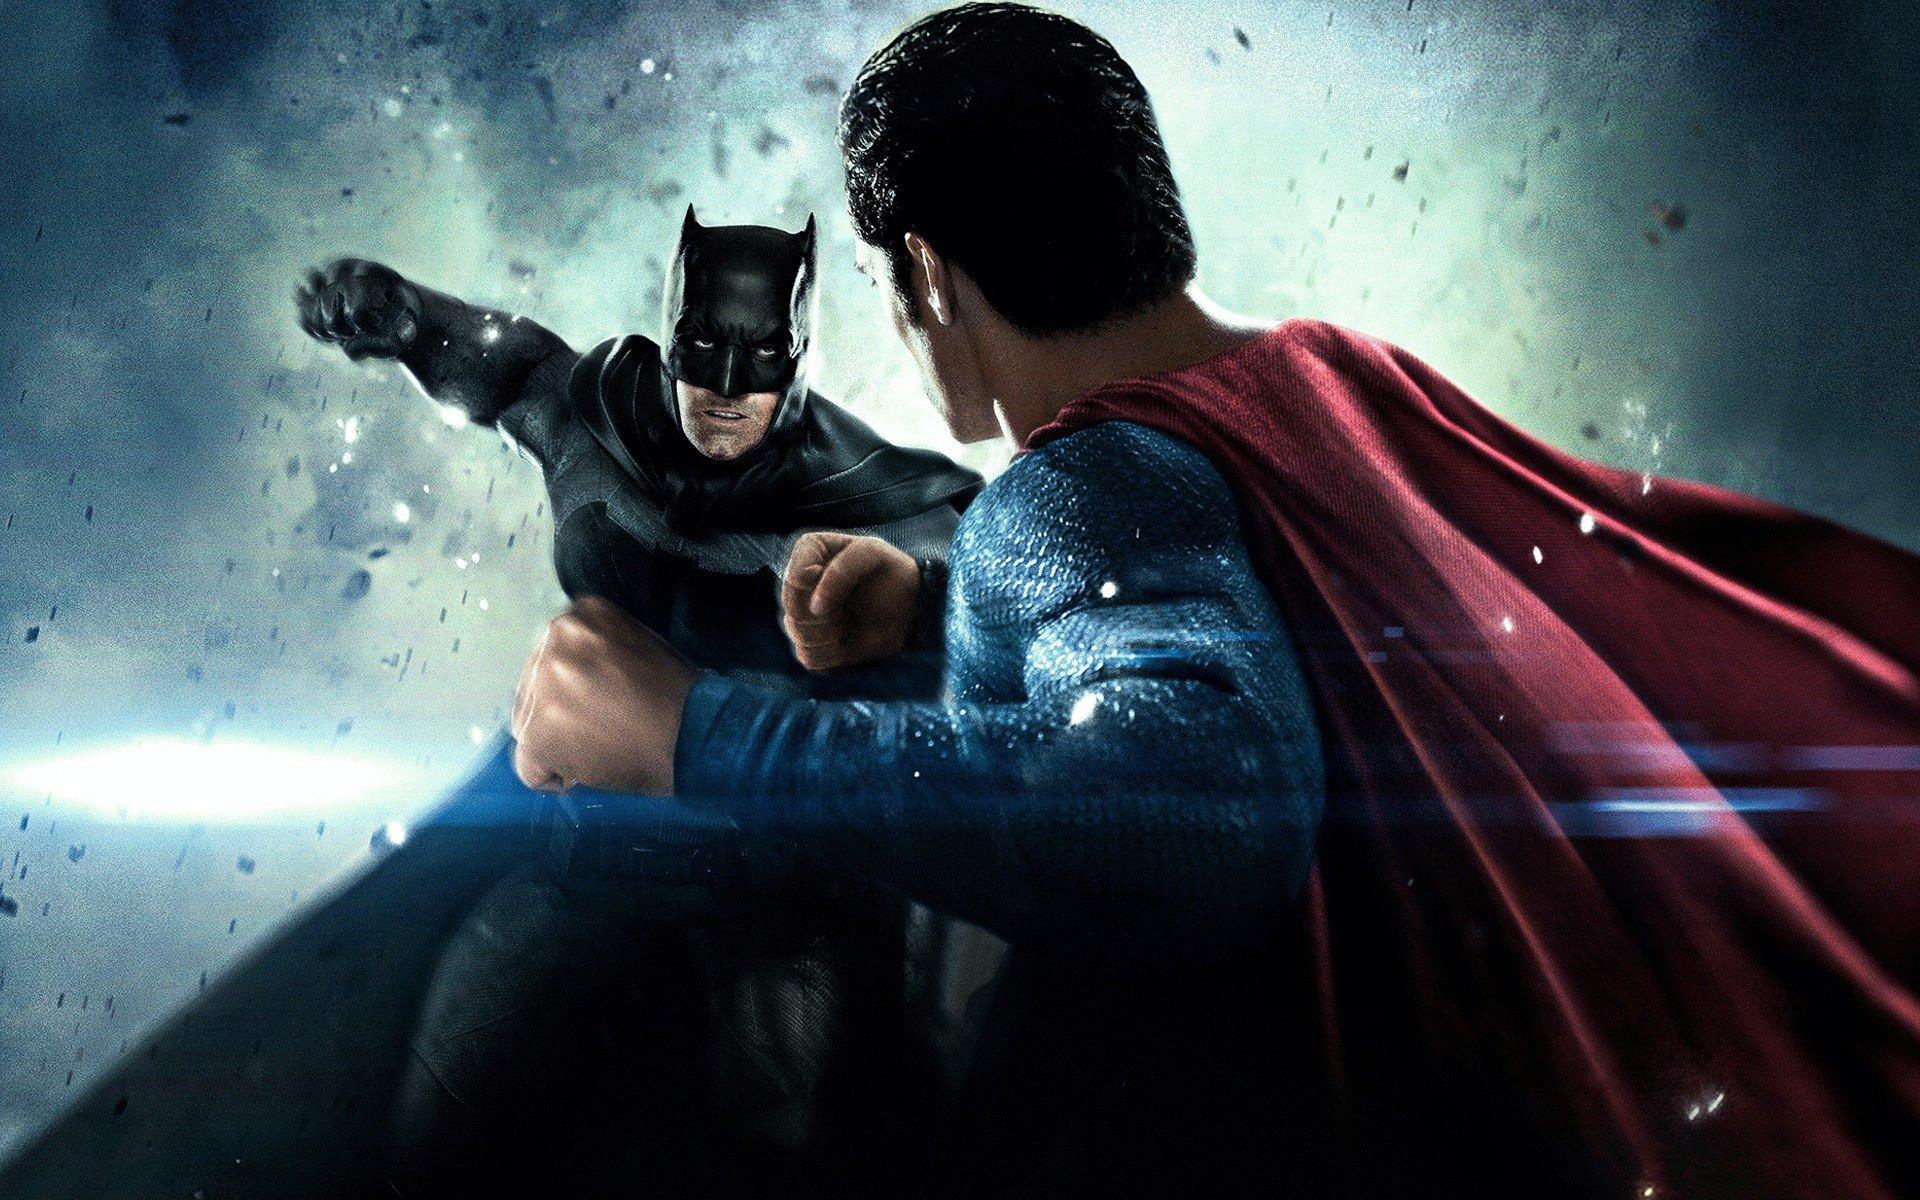 Hd Batman V Superman Dawn Of Justice Movie Hd Movies 4k